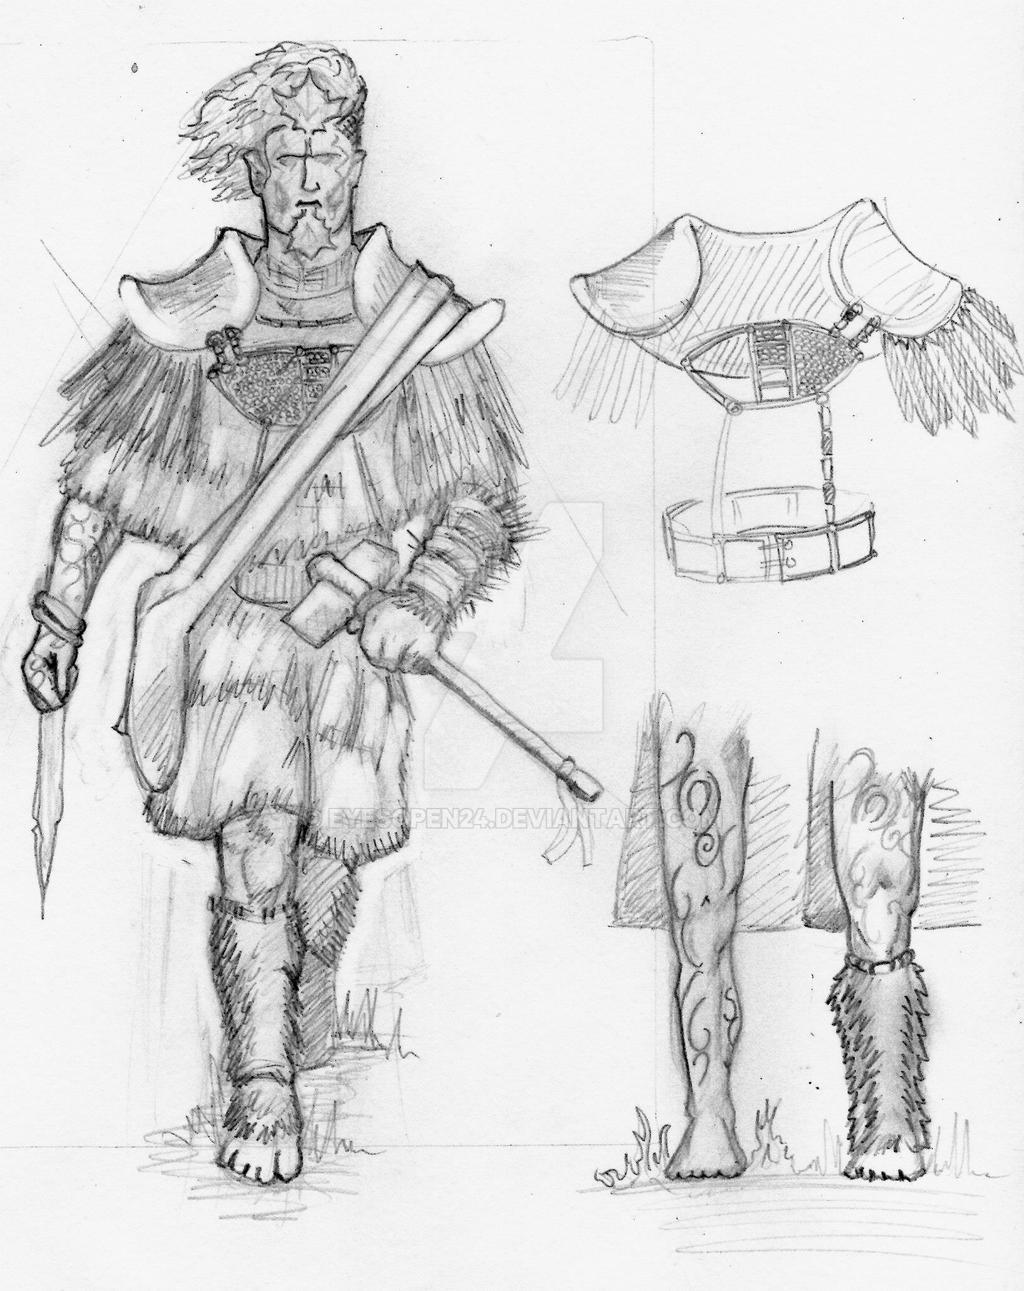 Elf Craftsman (Concept Art) by Eyesopen24